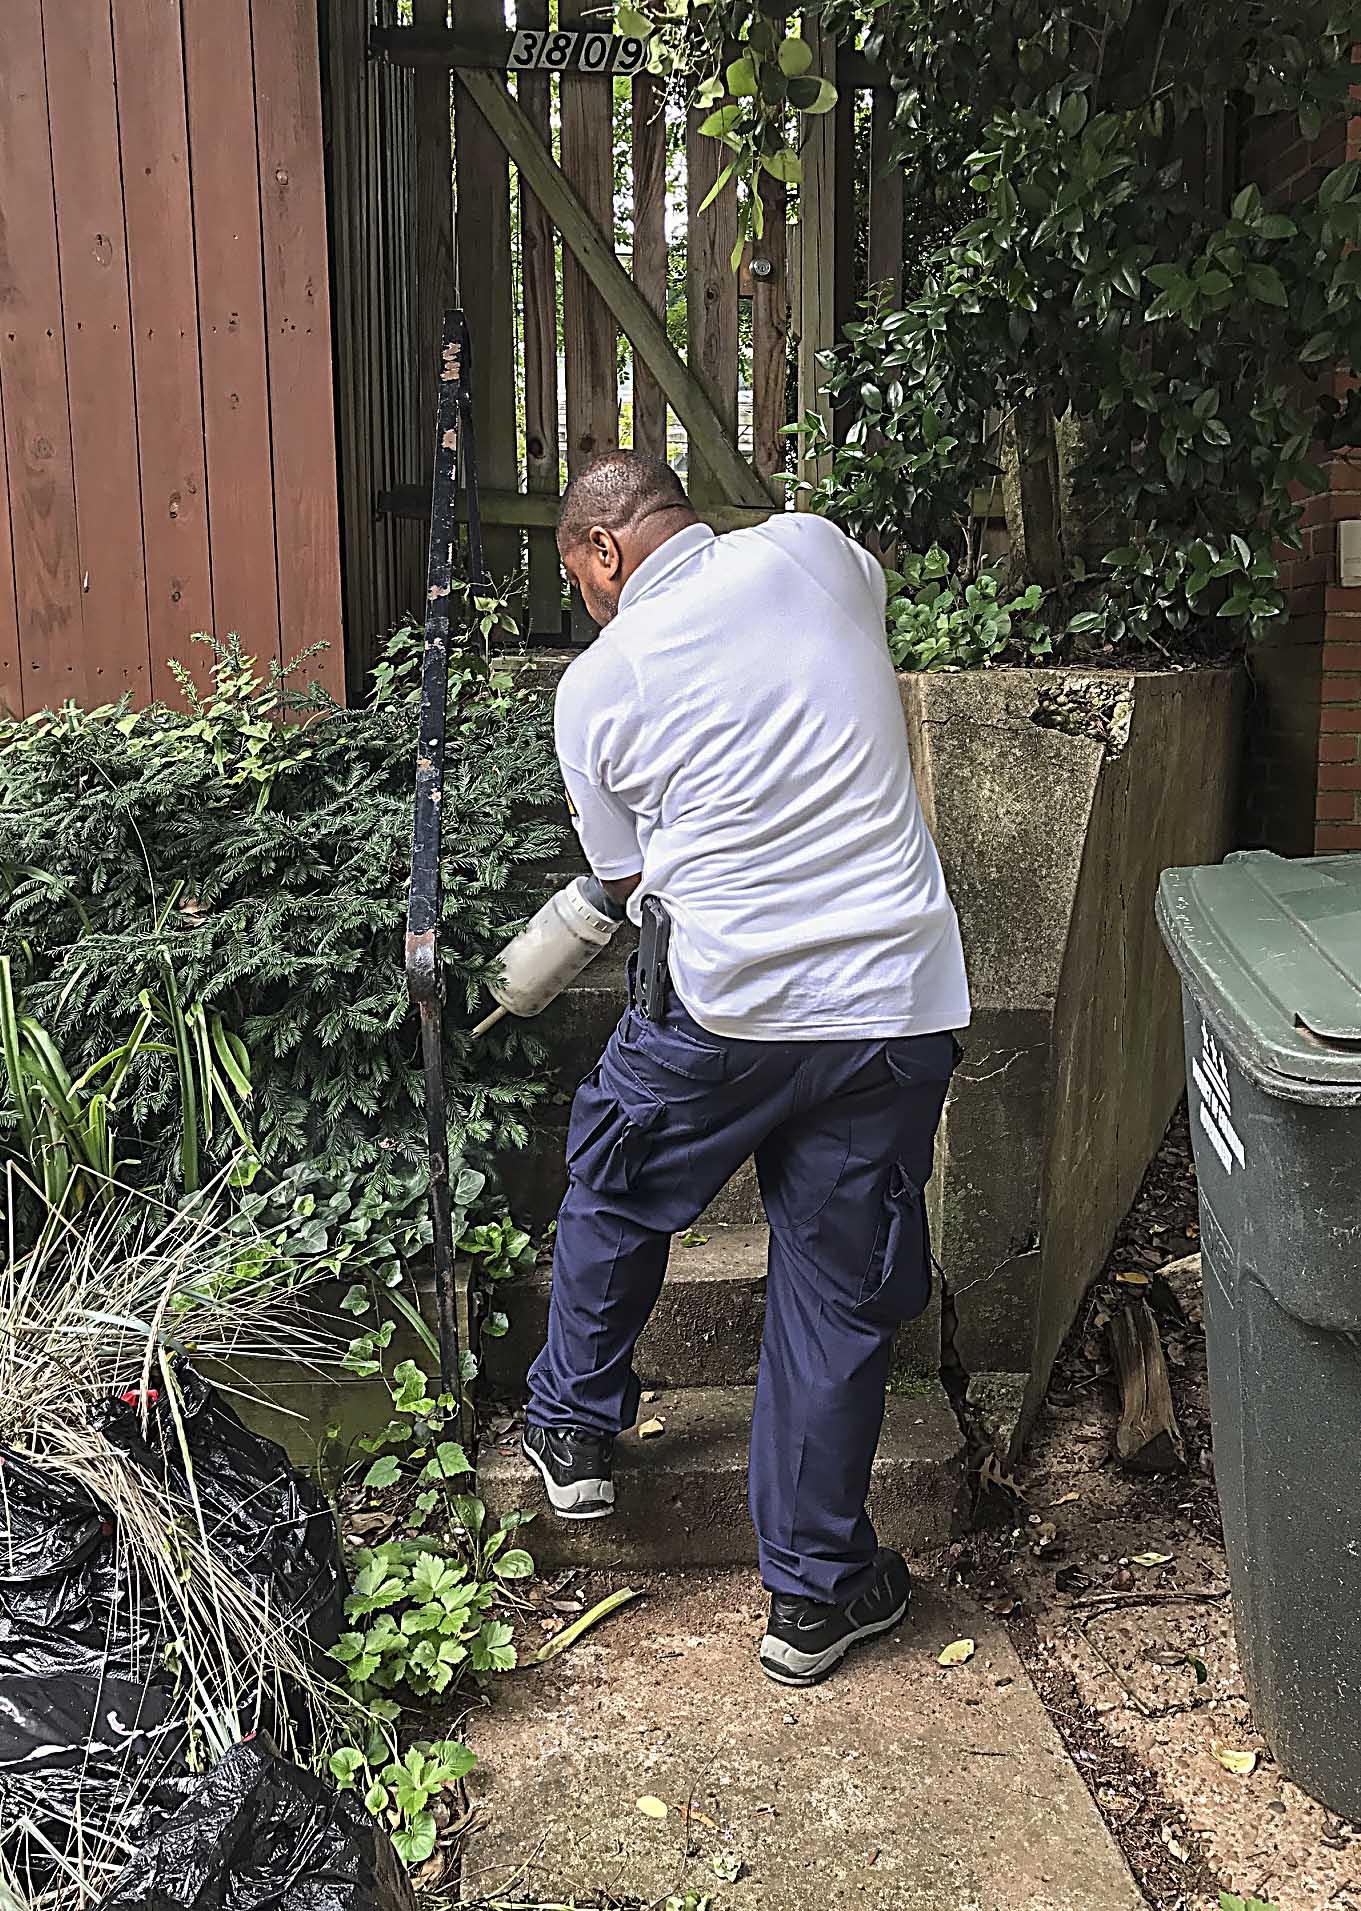 Rodent Control employee sprays a rat burrow.